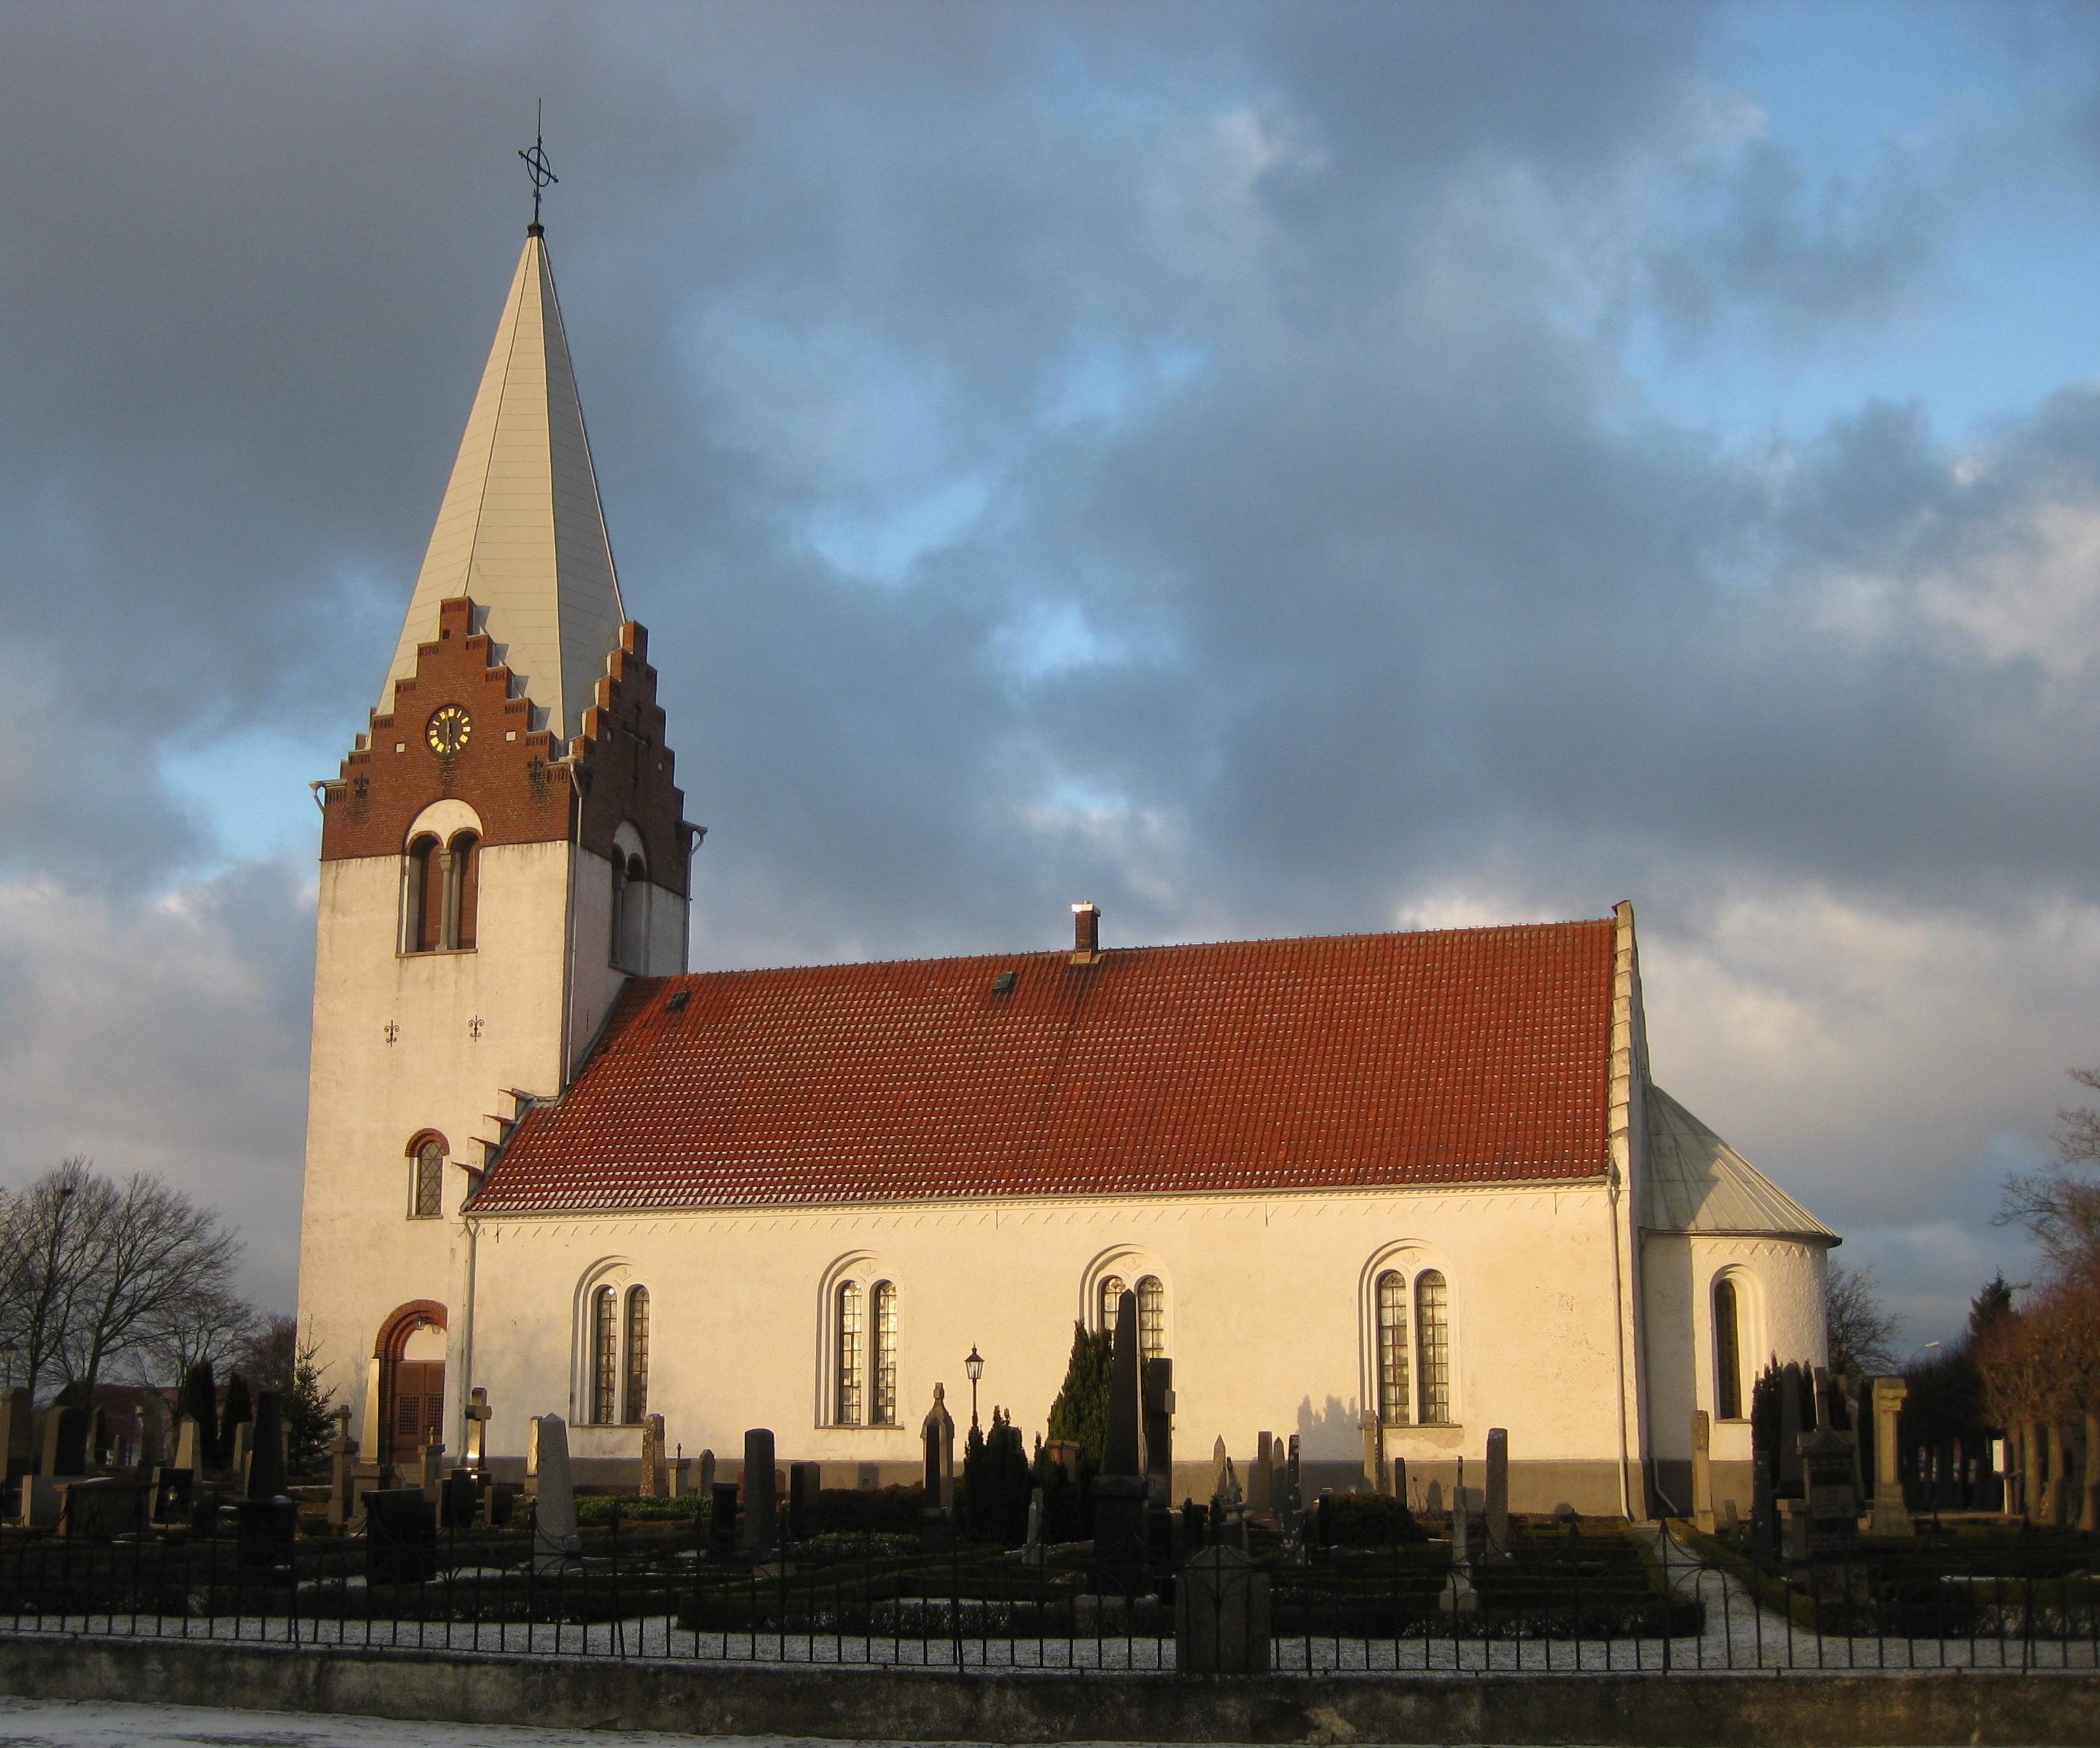 Tommarps kyrka